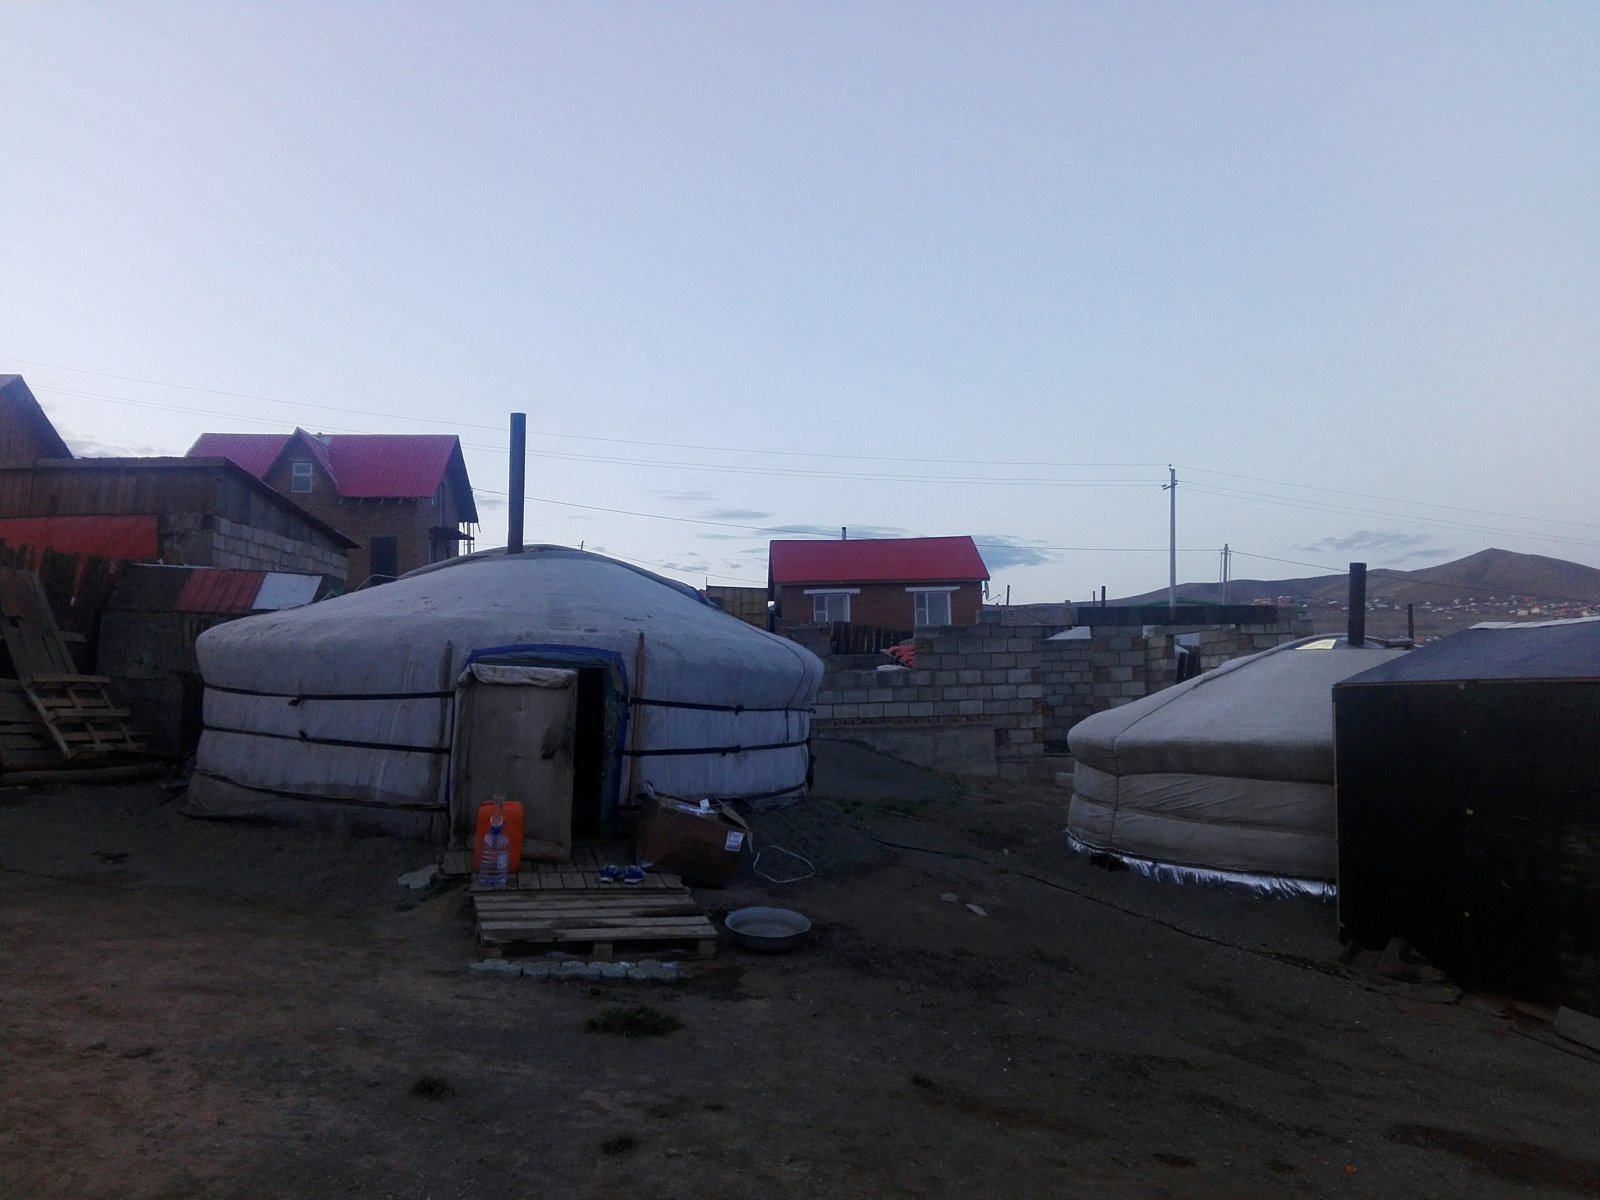 img_20160515_074928-jpg.30612_Mongolia Rainbow Horse Caravan_Travel Stories_Squat the Planet_2:55 AM